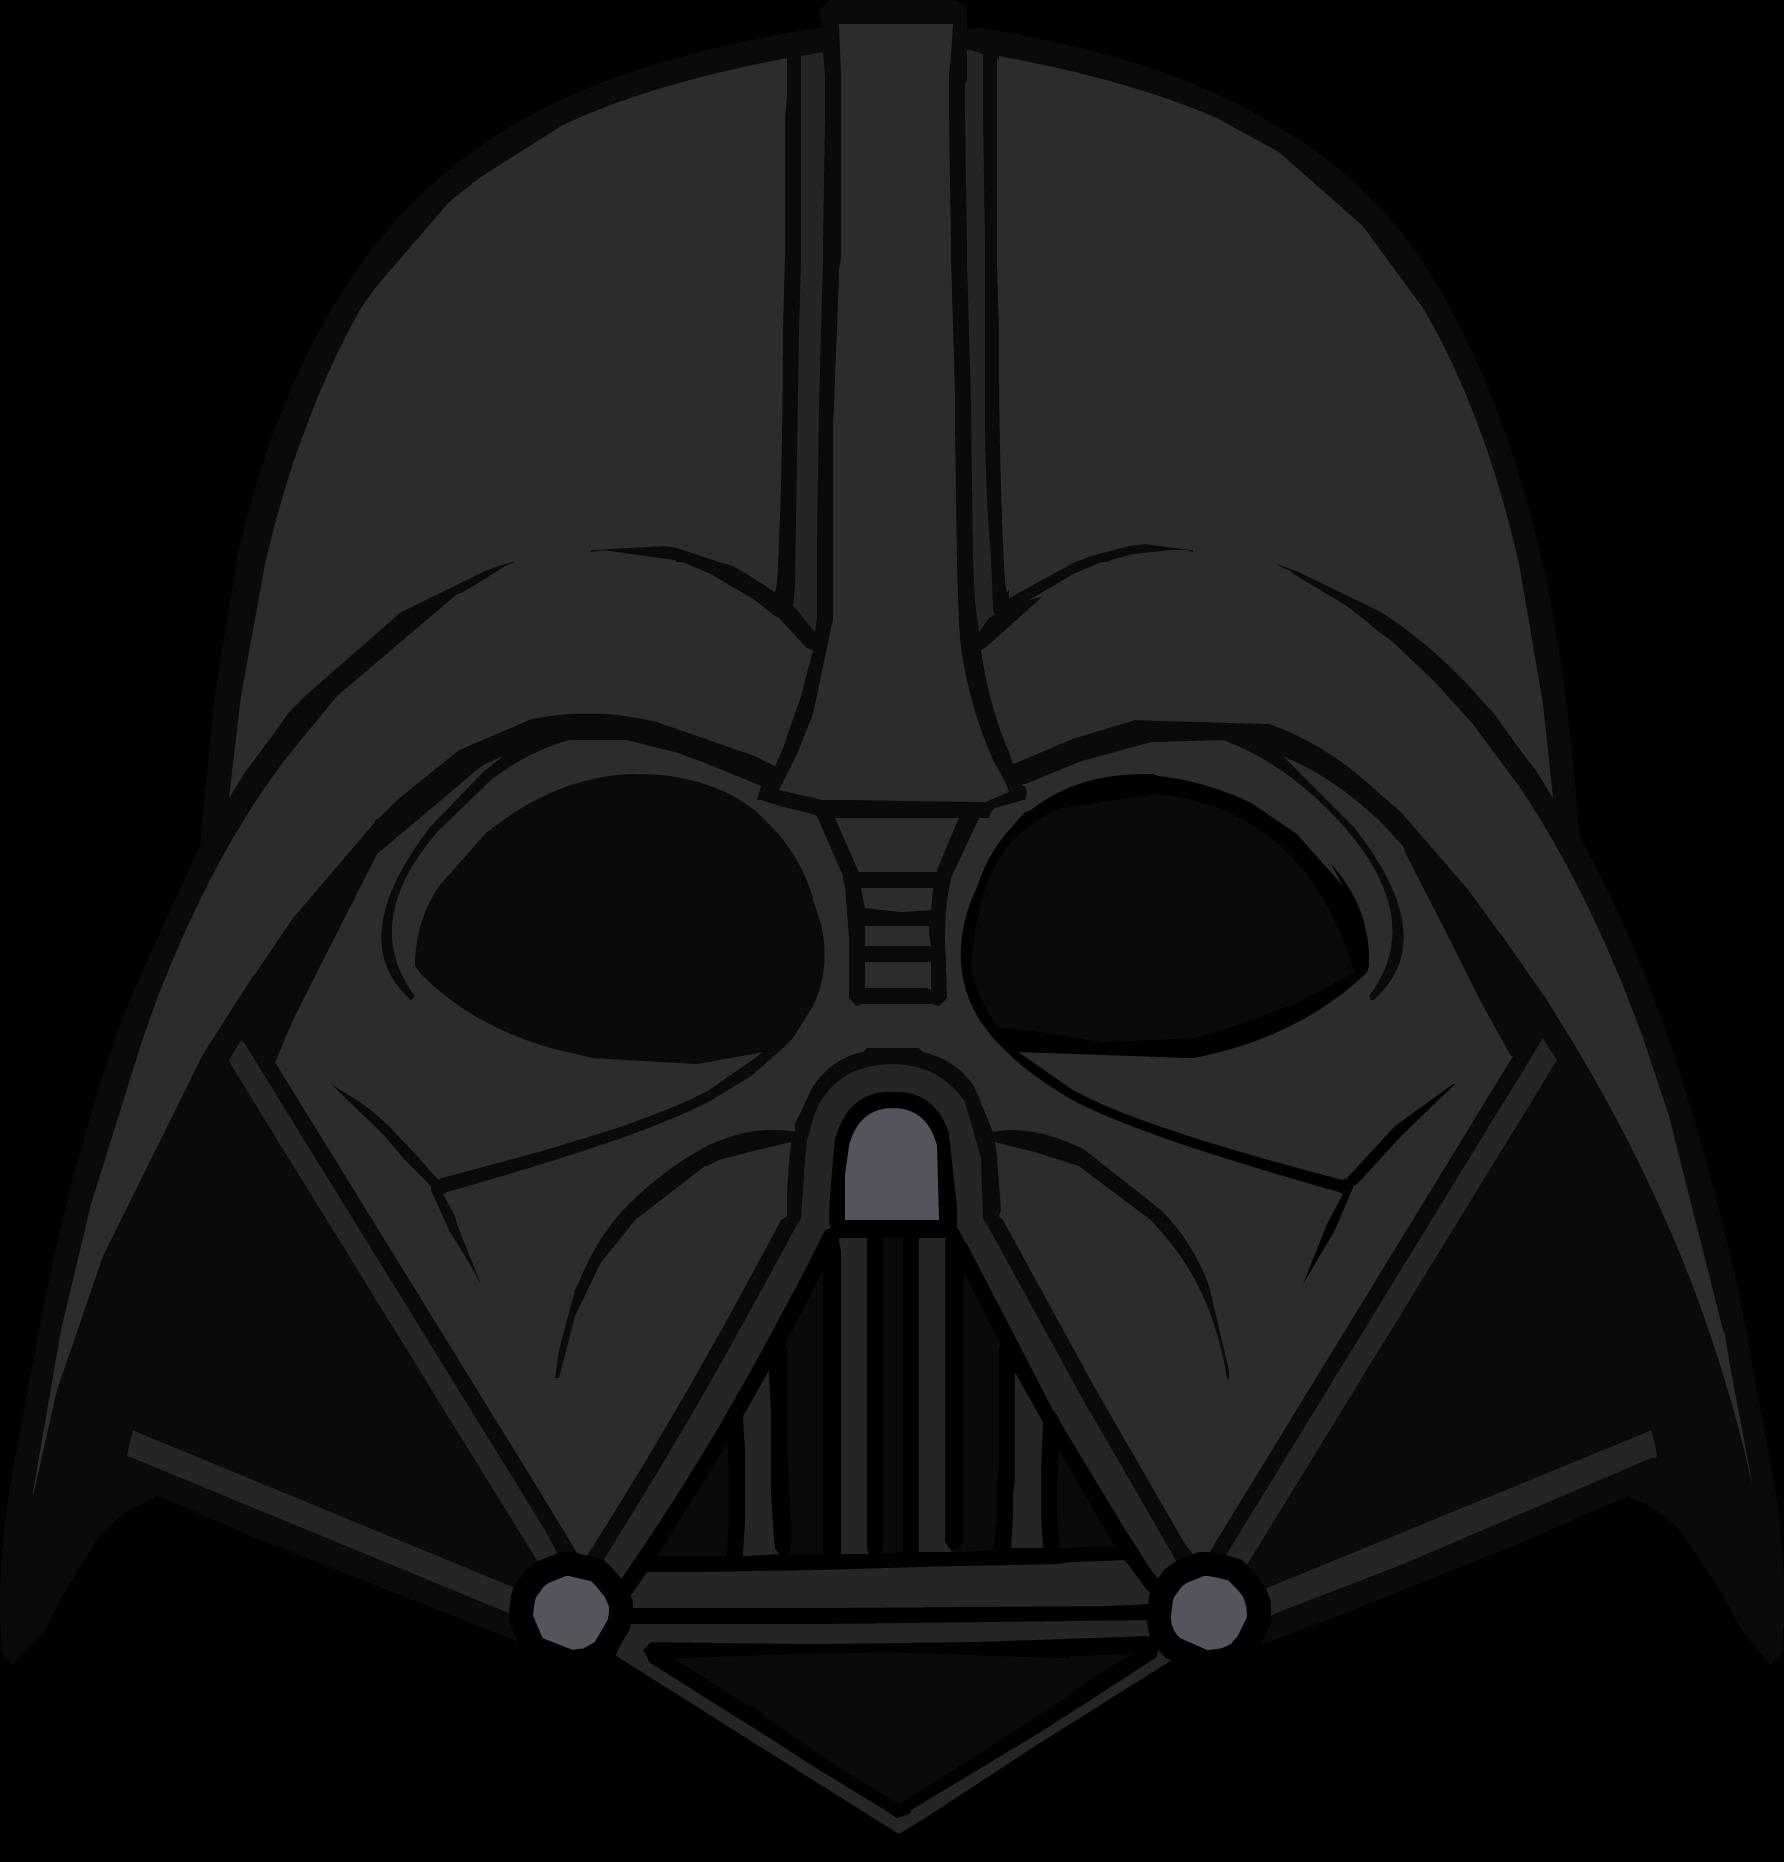 Darth Vader Clipart Invisible Darth Vader Invisible Transparent